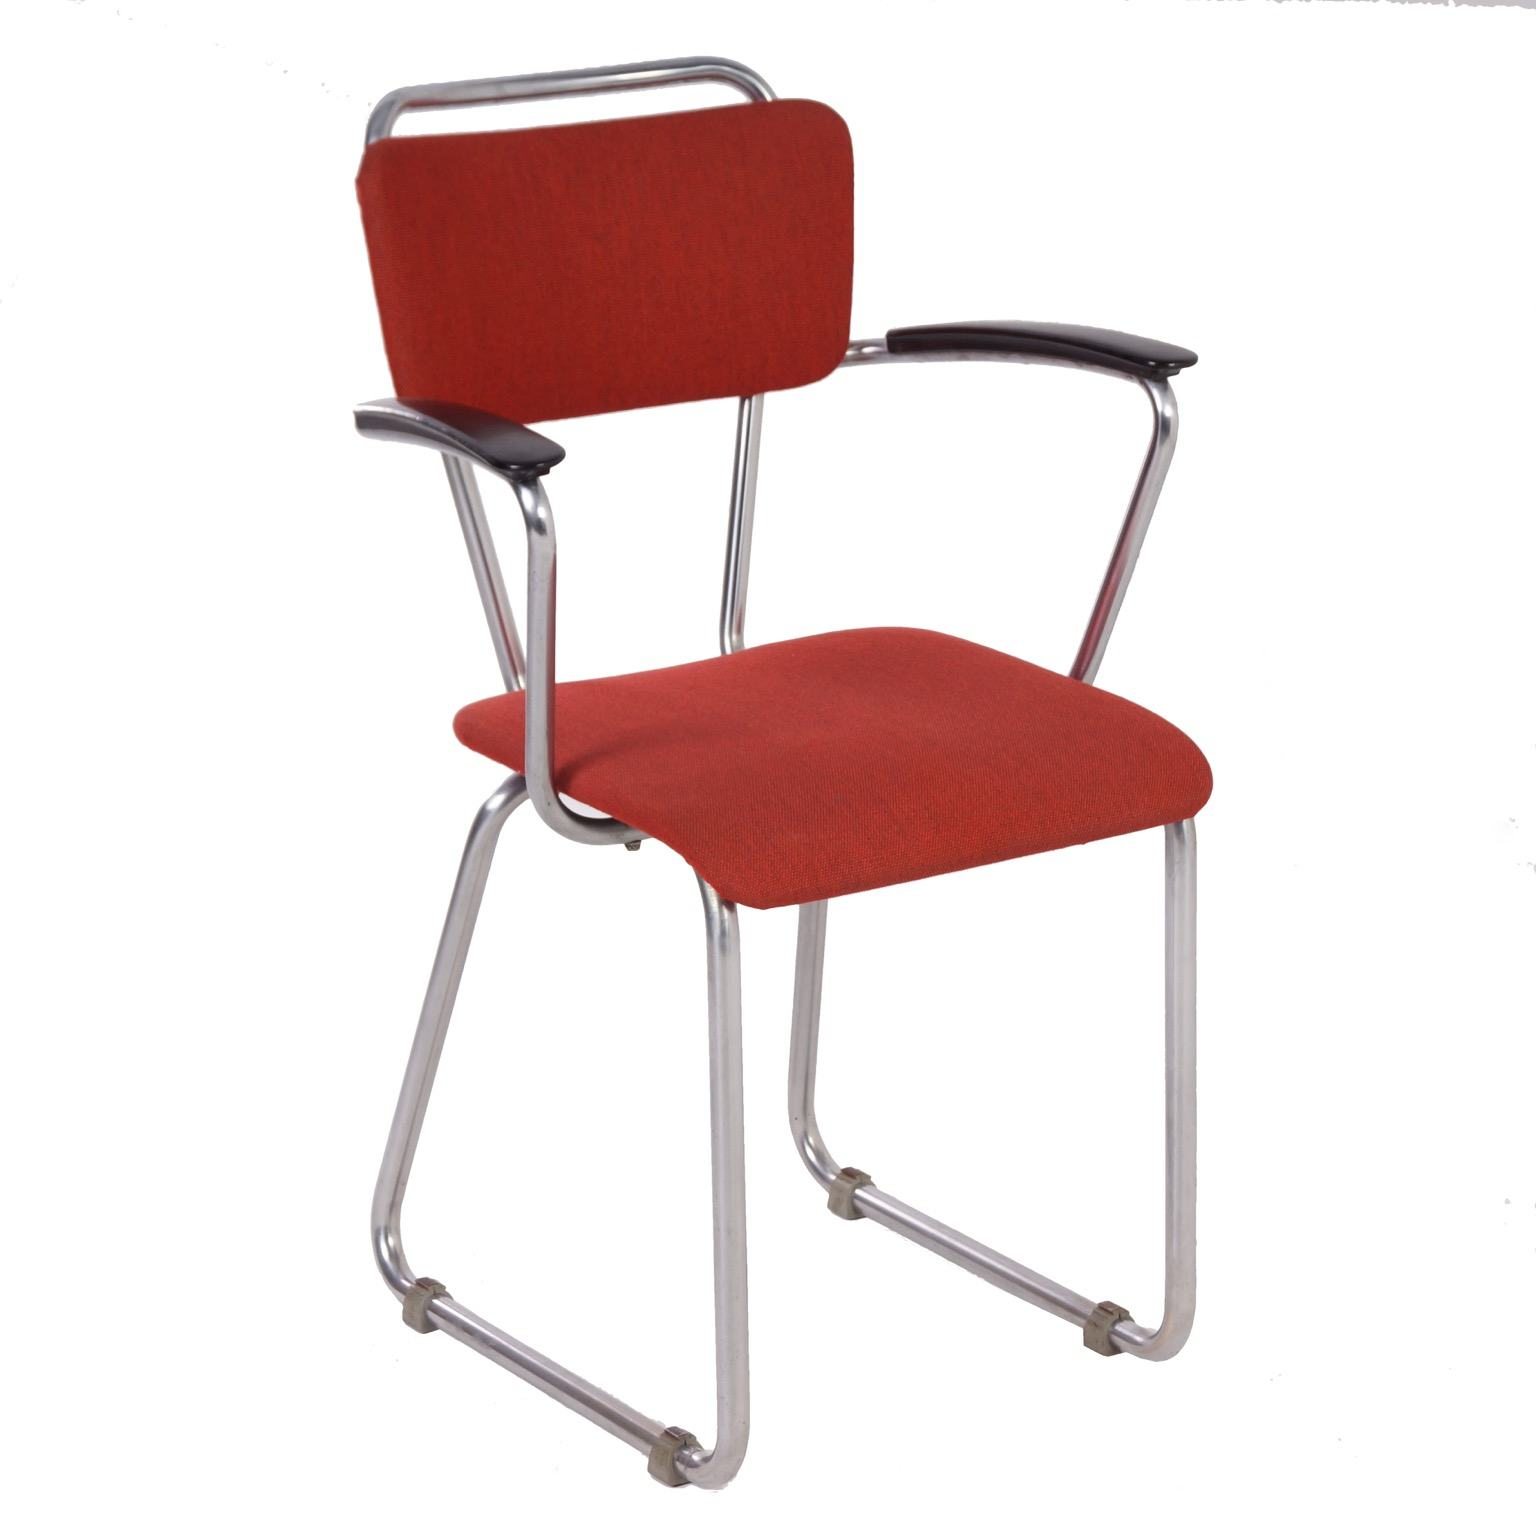 Gispen 214 bureaustoel vintage design meubels vintage for Bureaustoel vintage